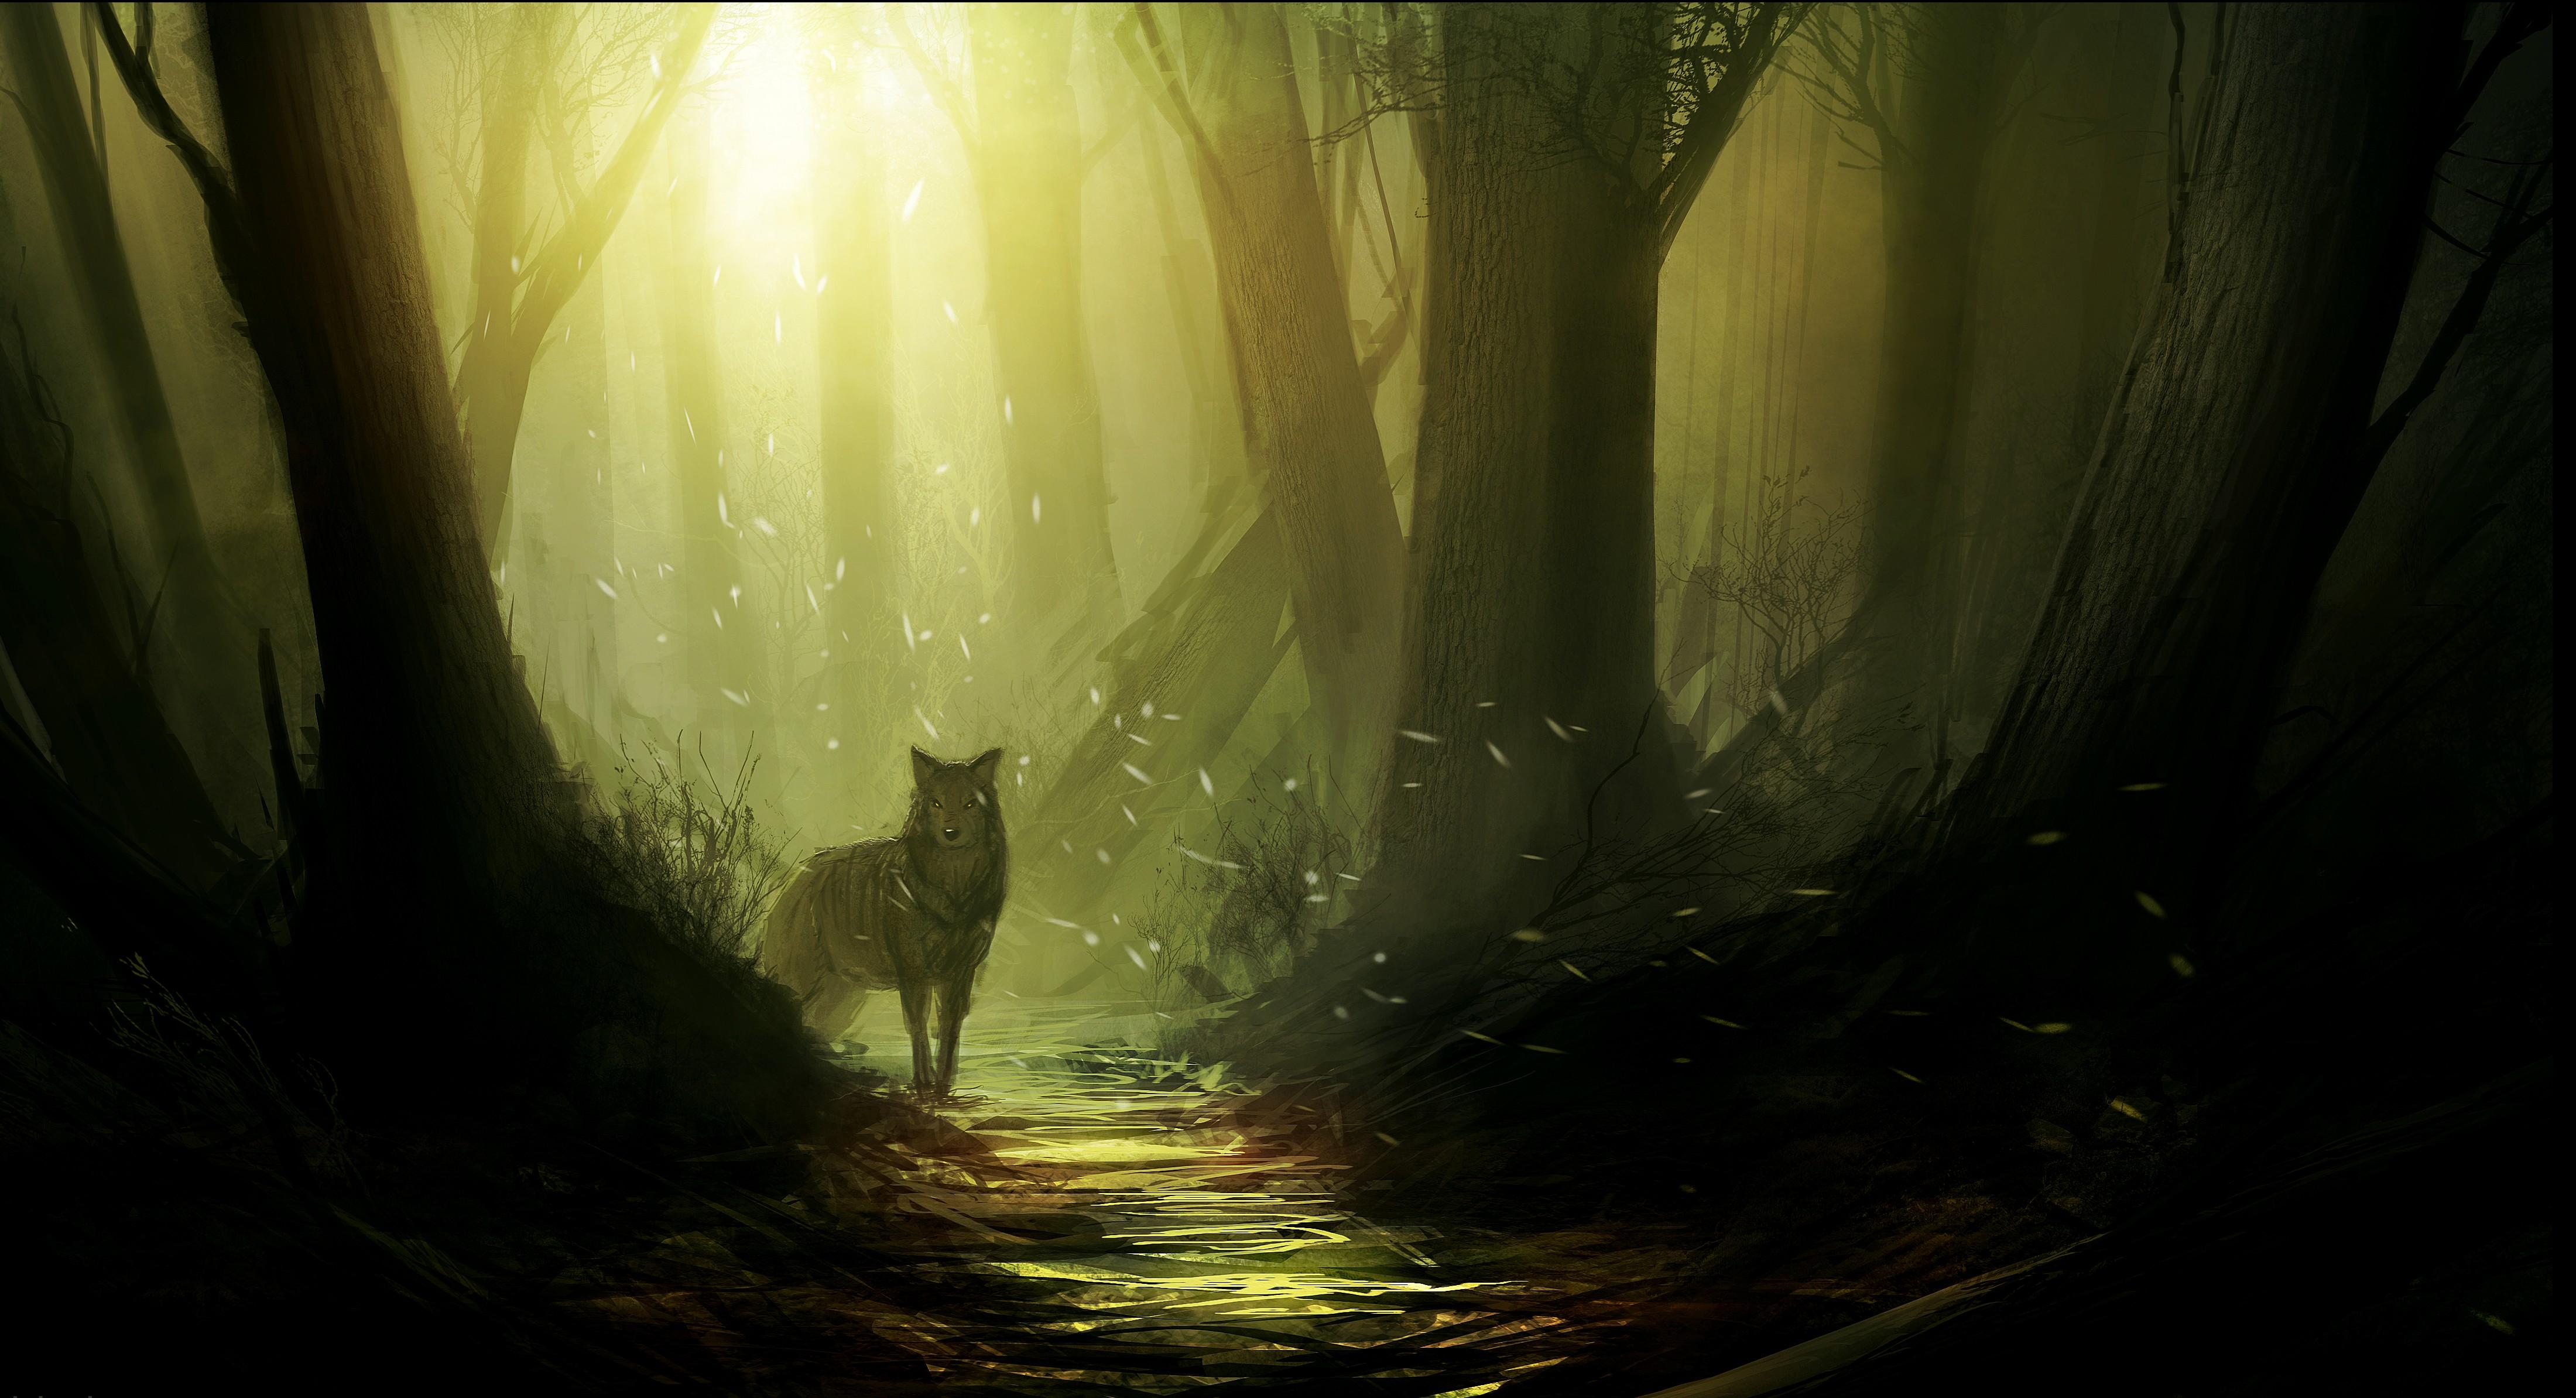 Lonely Girl Walking Wallpaper Wolf 4k Ultra Hd Wallpaper Background Image 4400x2388